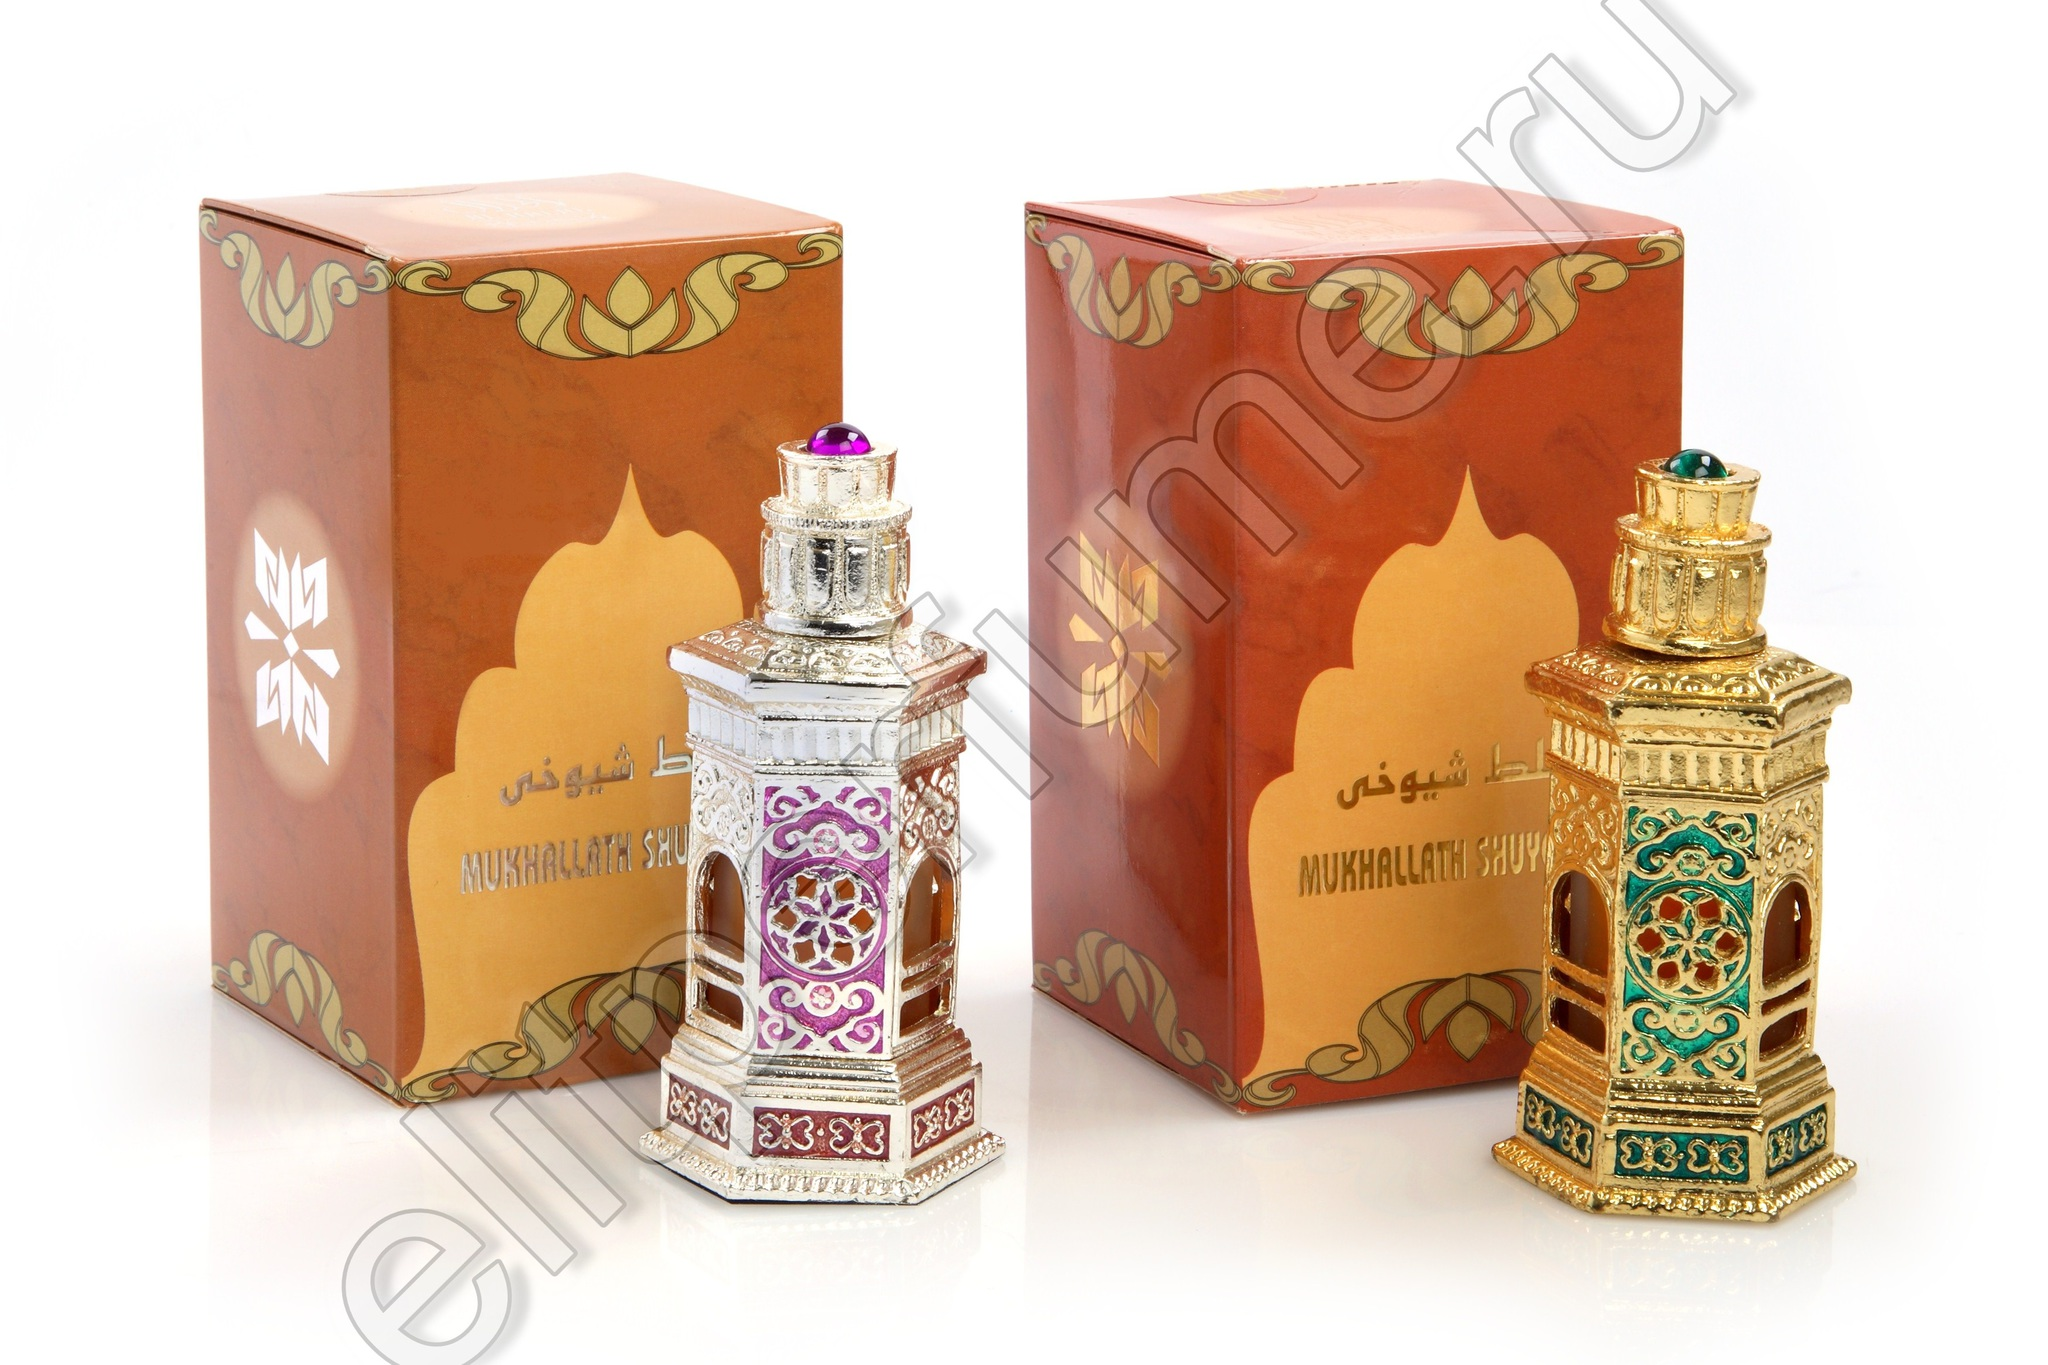 Пробники для Мухаллат Шуюхи (Золото / Серебро) Mukhallath Shuyookhi (Gold / Silver) 1 мл арабские масляные духи от Аль Харамайн Al Haramin Perfumes